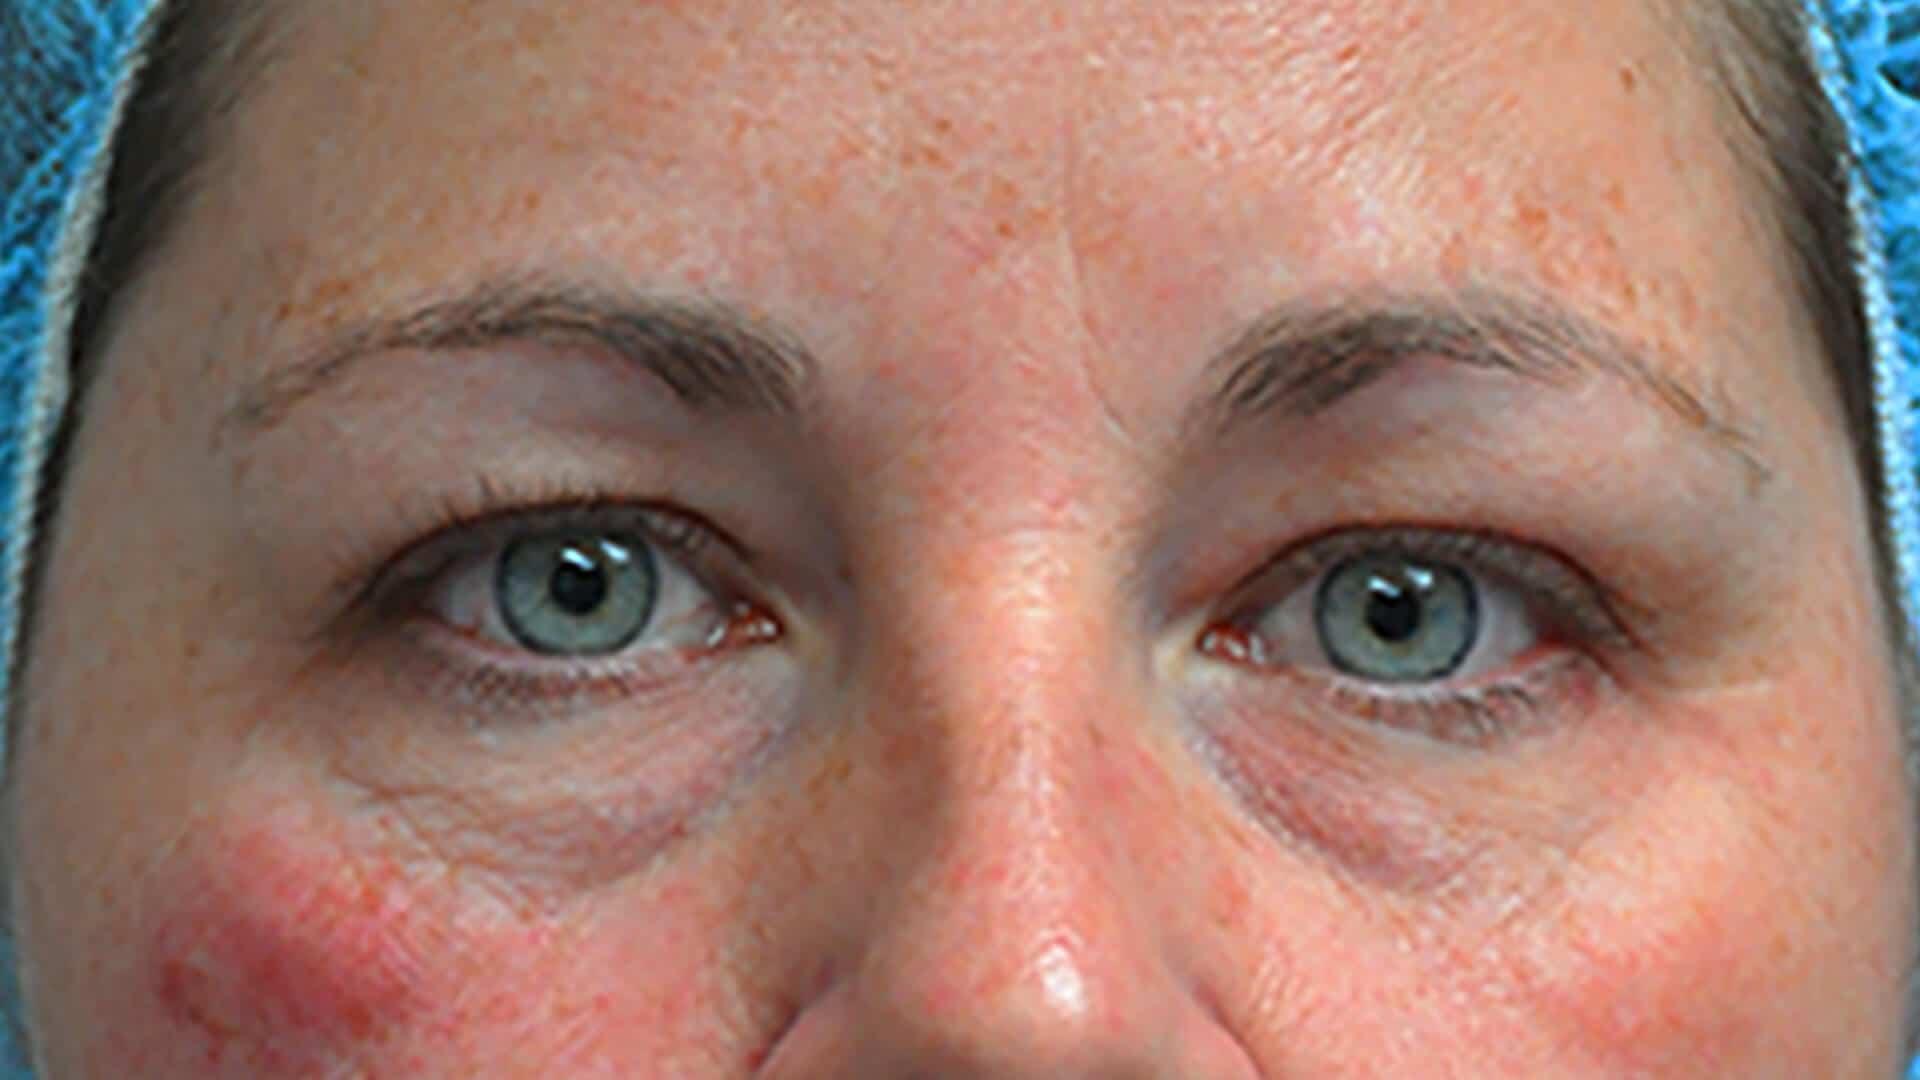 , Blepharoplasty (Eyelid Lift) – Lower